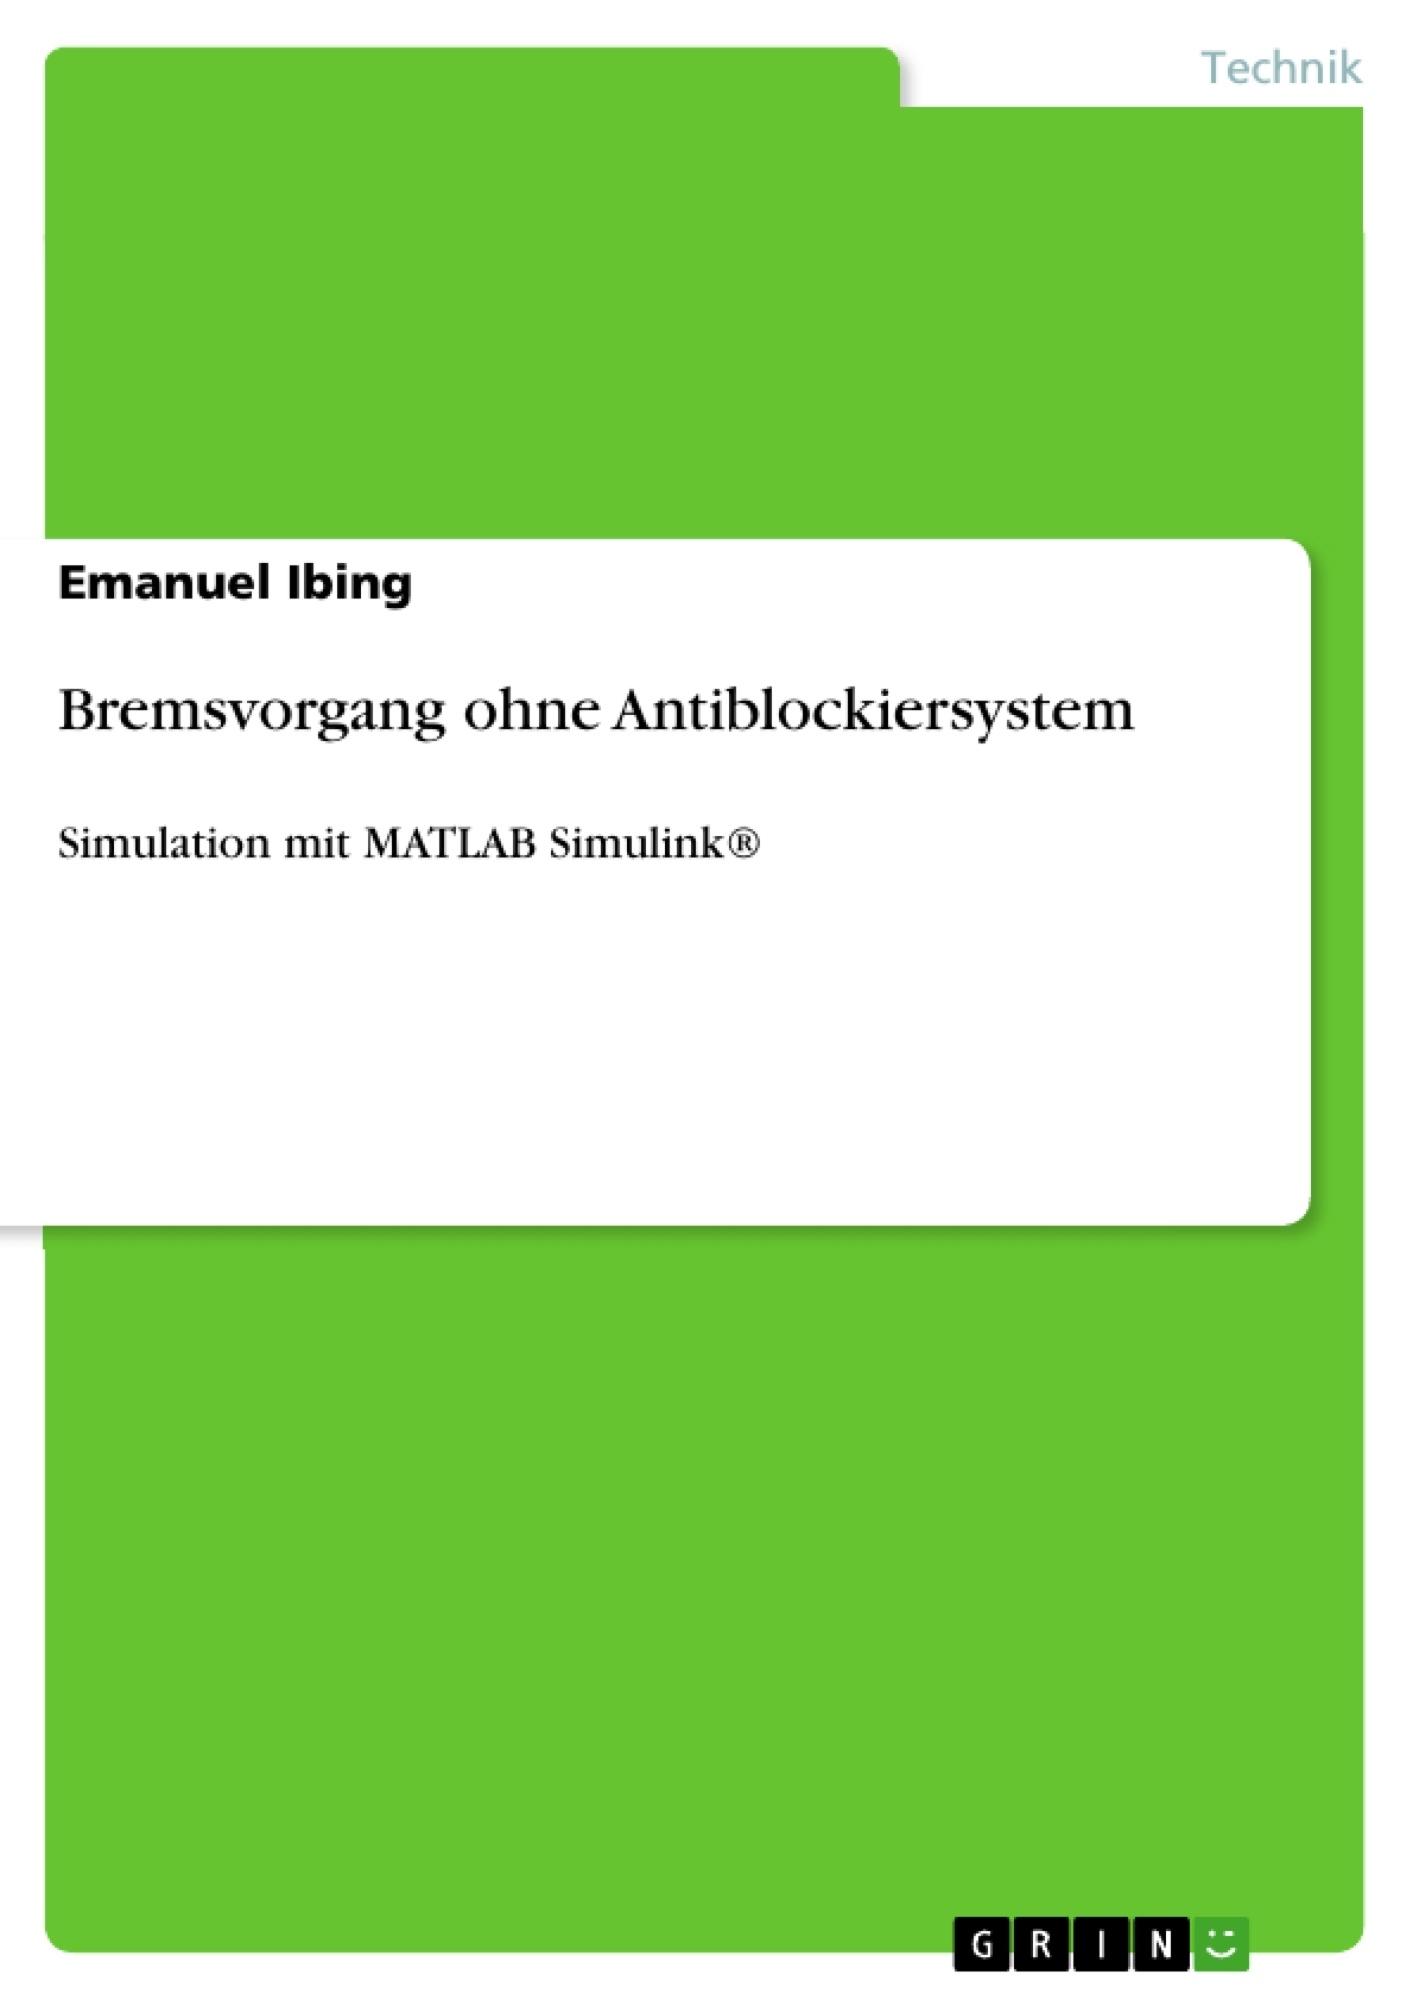 Titel: Bremsvorgang ohne Antiblockiersystem